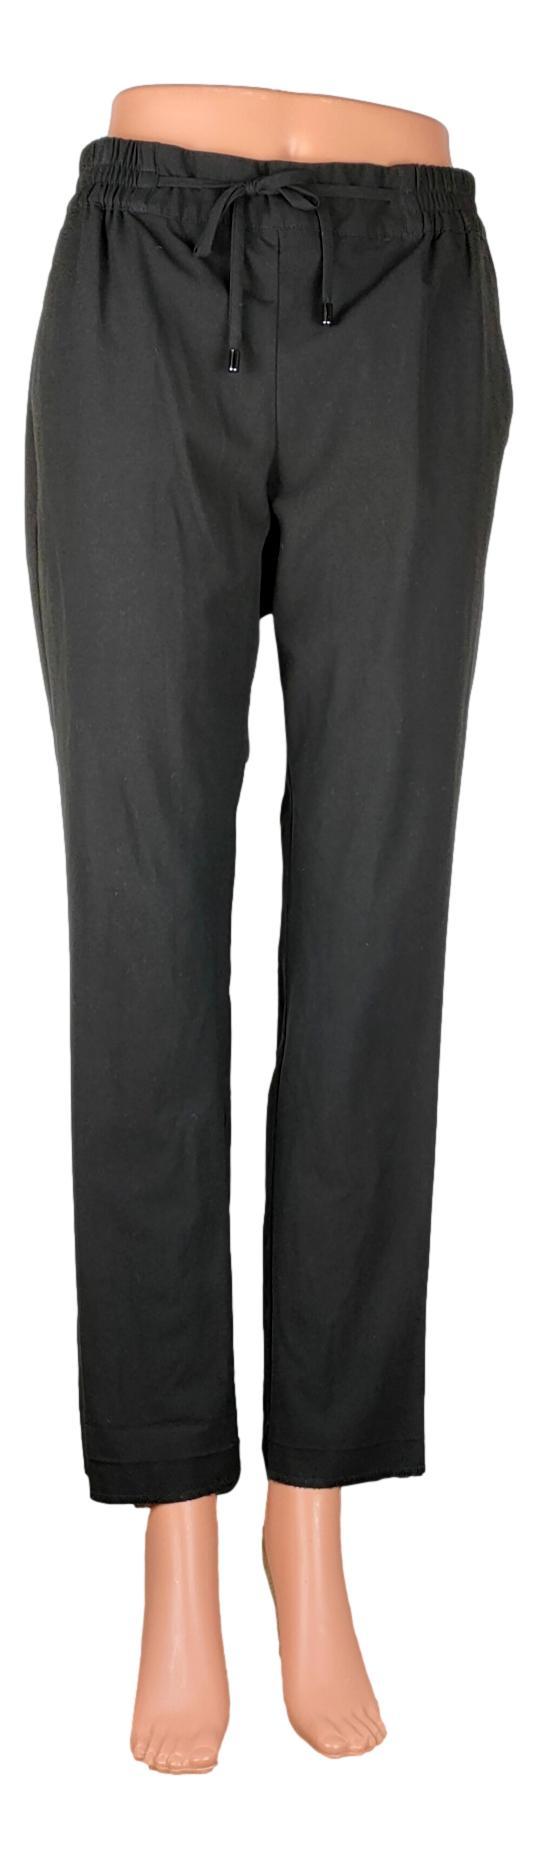 Pantalon Promod - taille 38